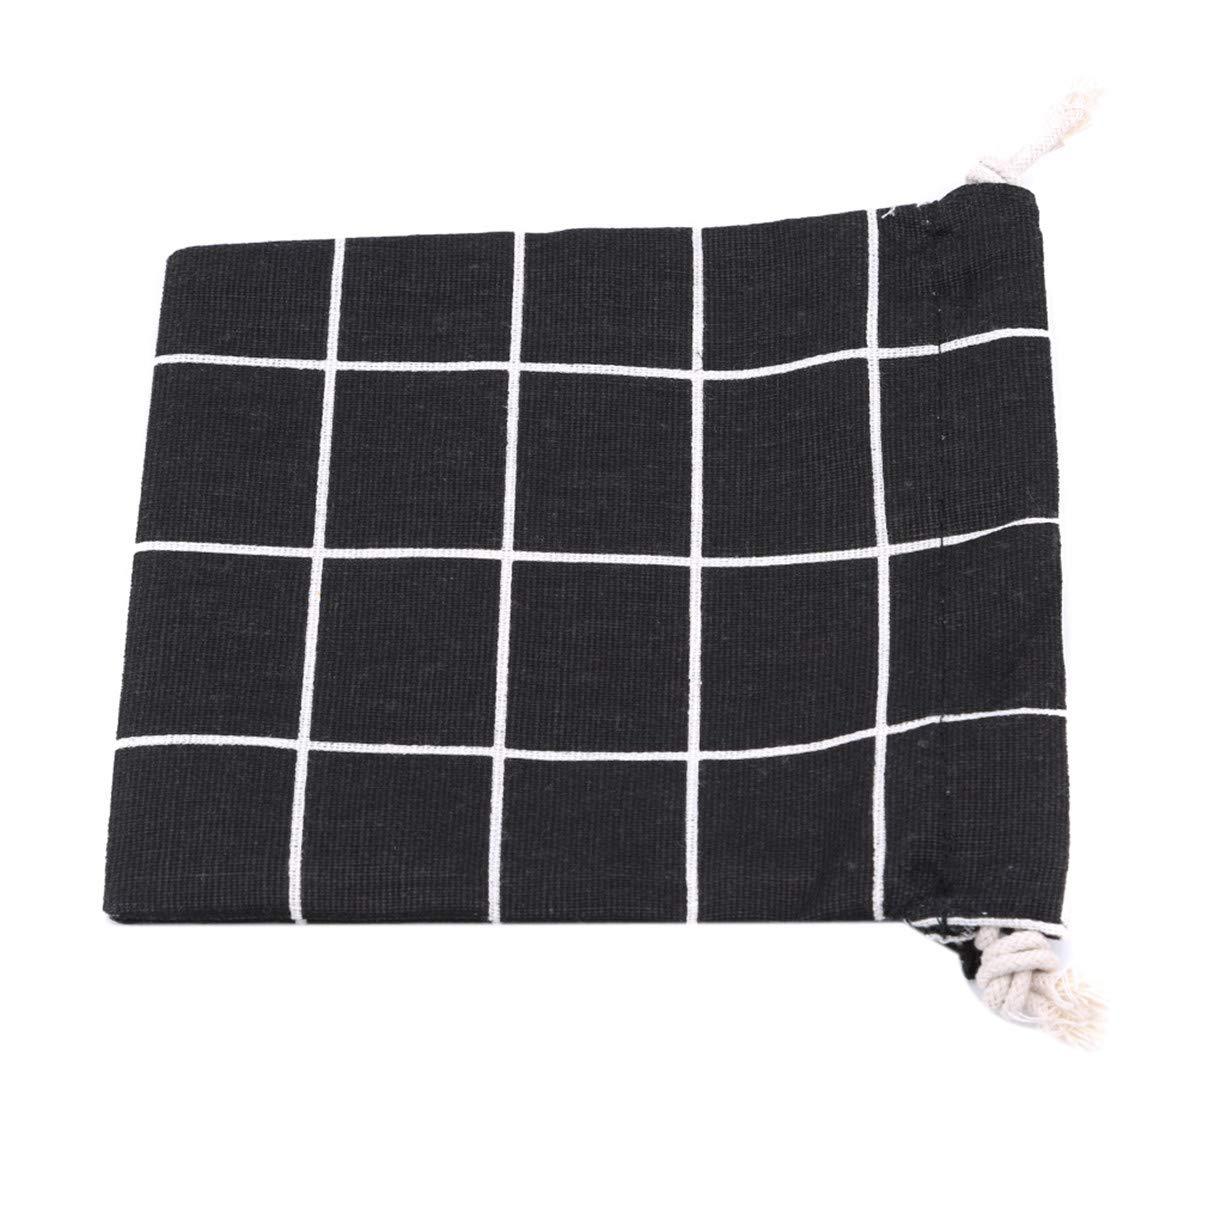 Essencedelight Storage Pouch Bag Unisex Dust-Proof Drawstring Handbags Reusable Cotton Linen Travel Bags for Tea Favor Gift